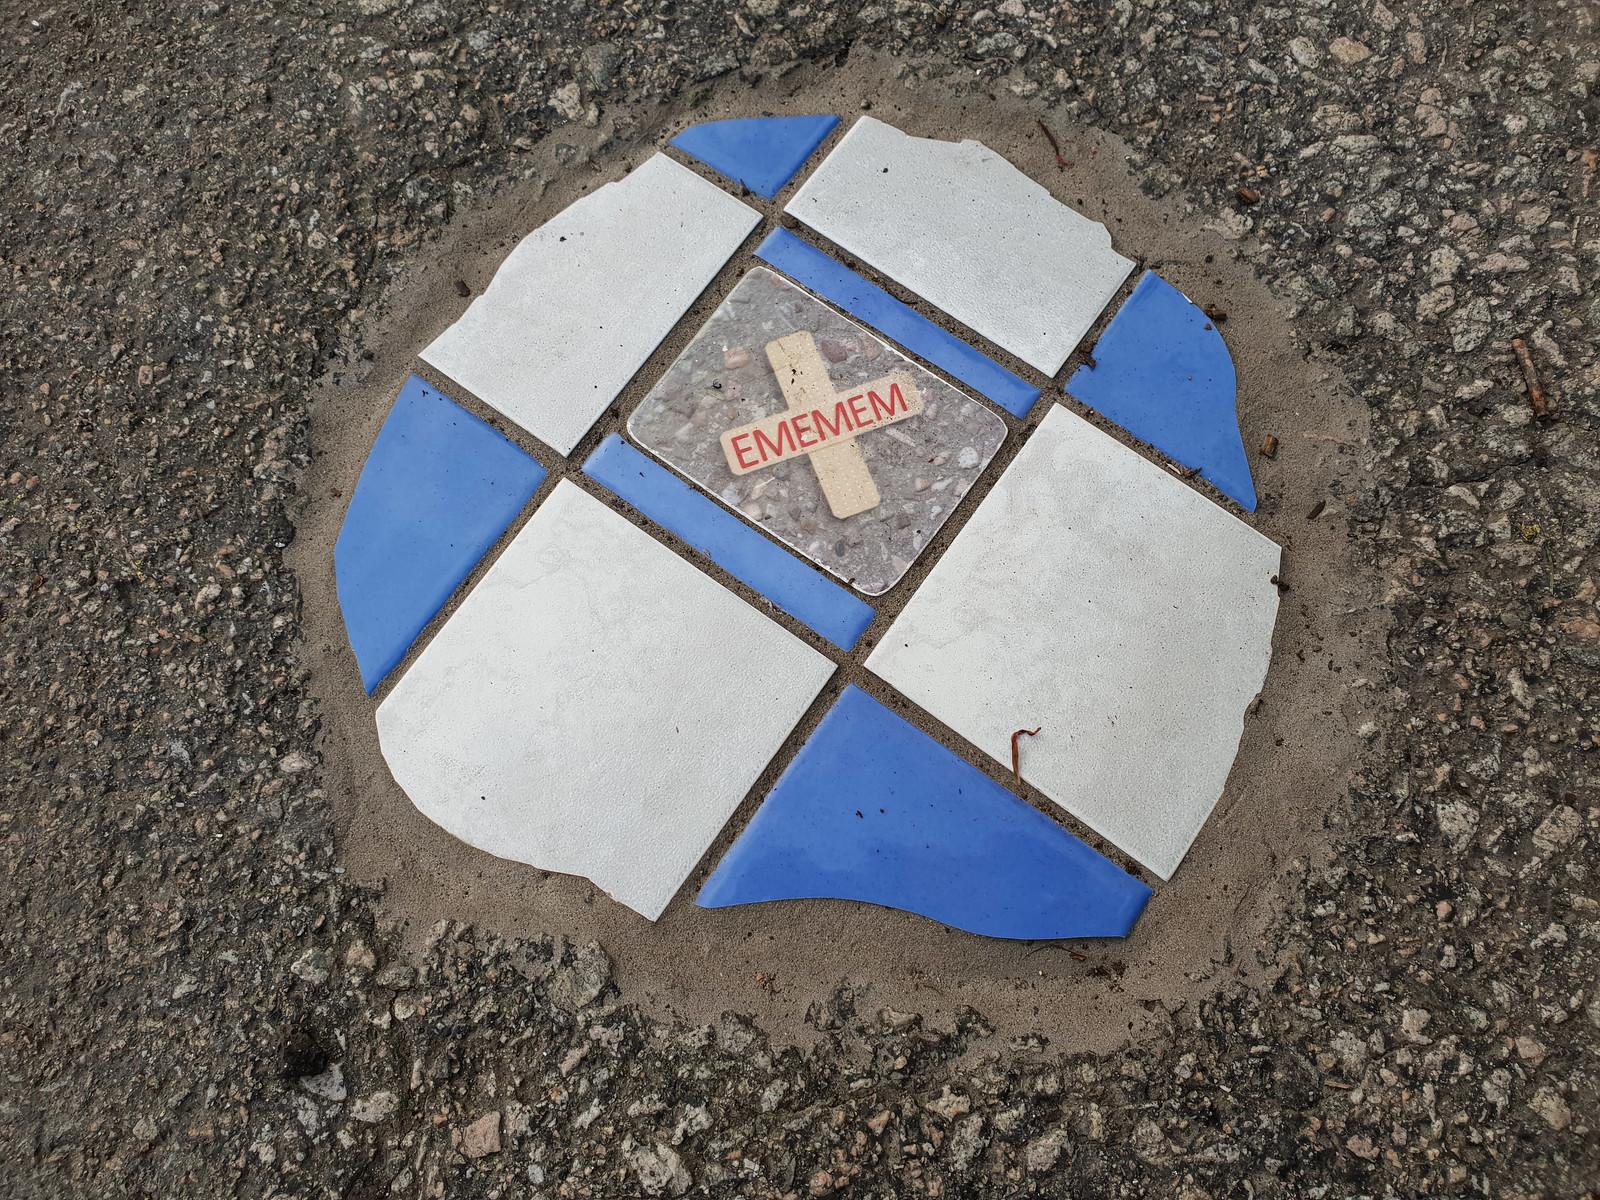 Nuart Aberdeen 2019: Ememem